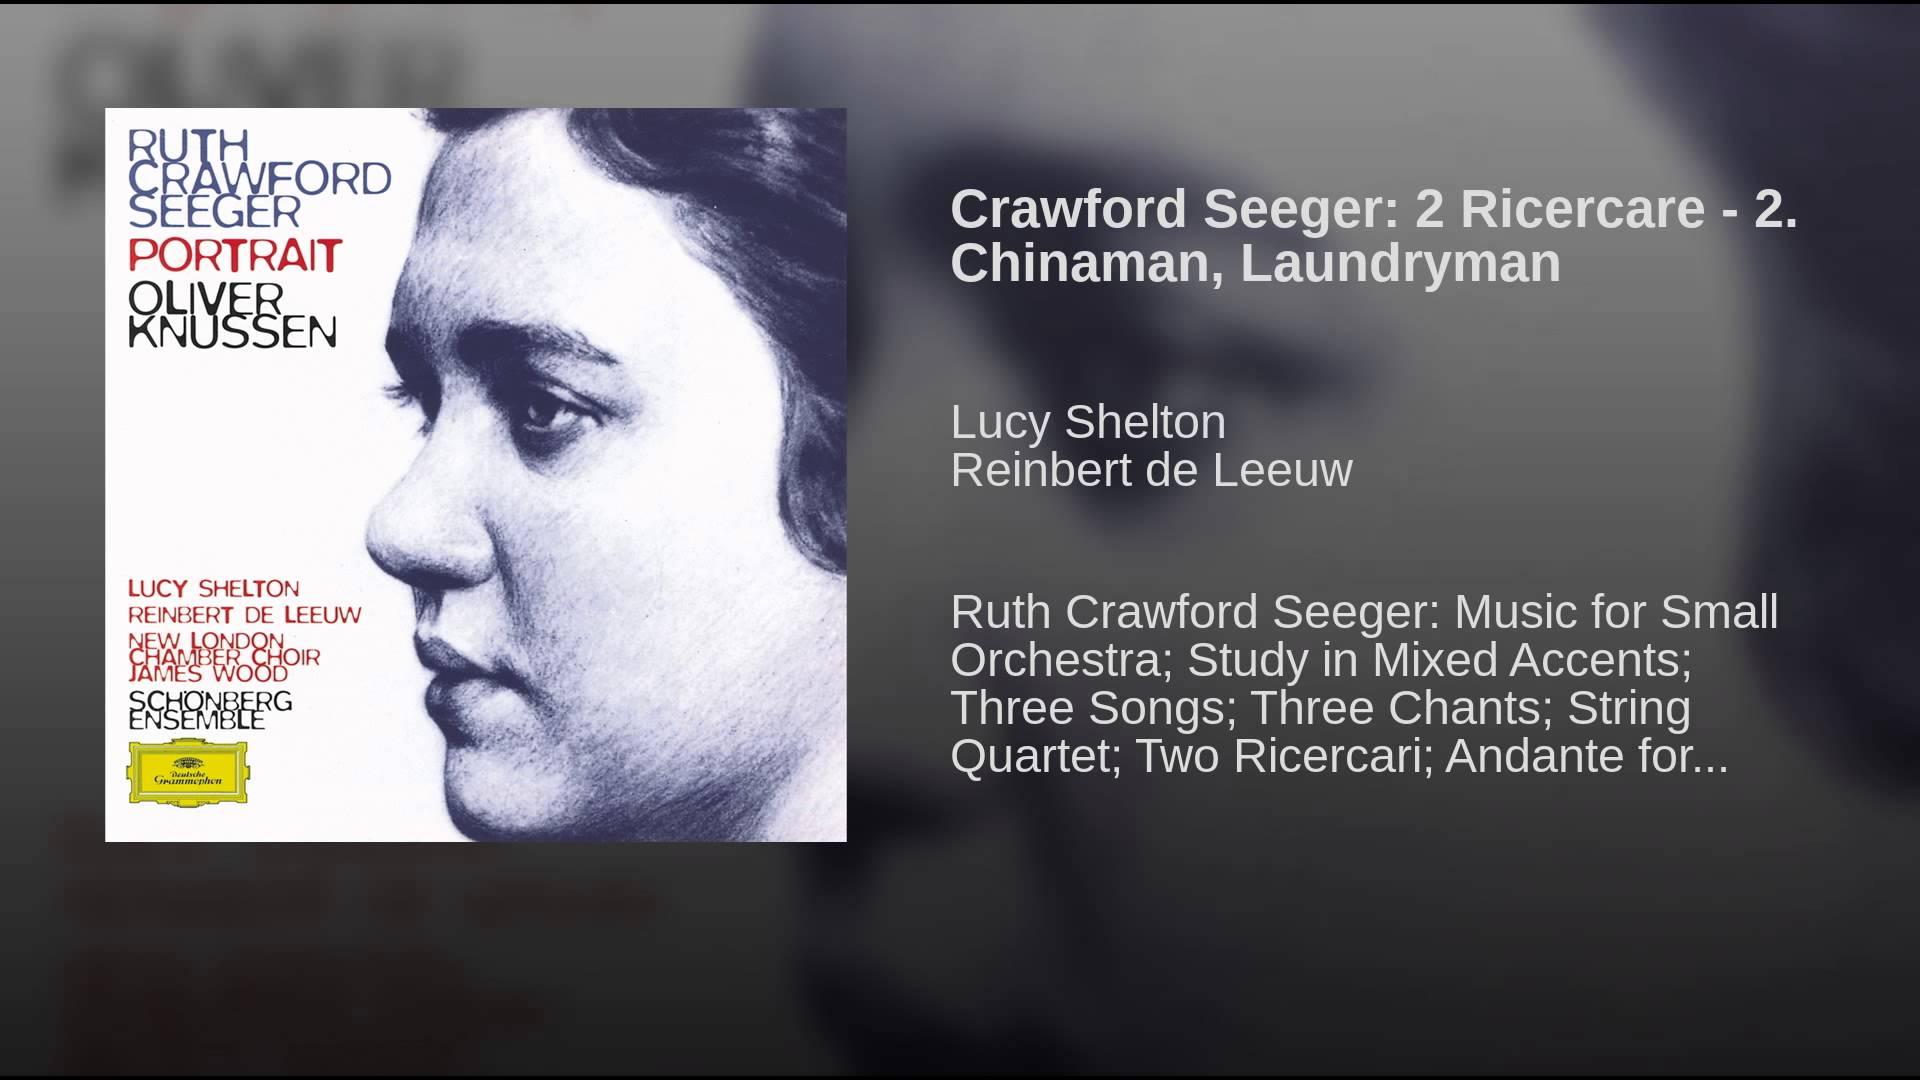 Ruth Crawford: Sacco and Vanzetti